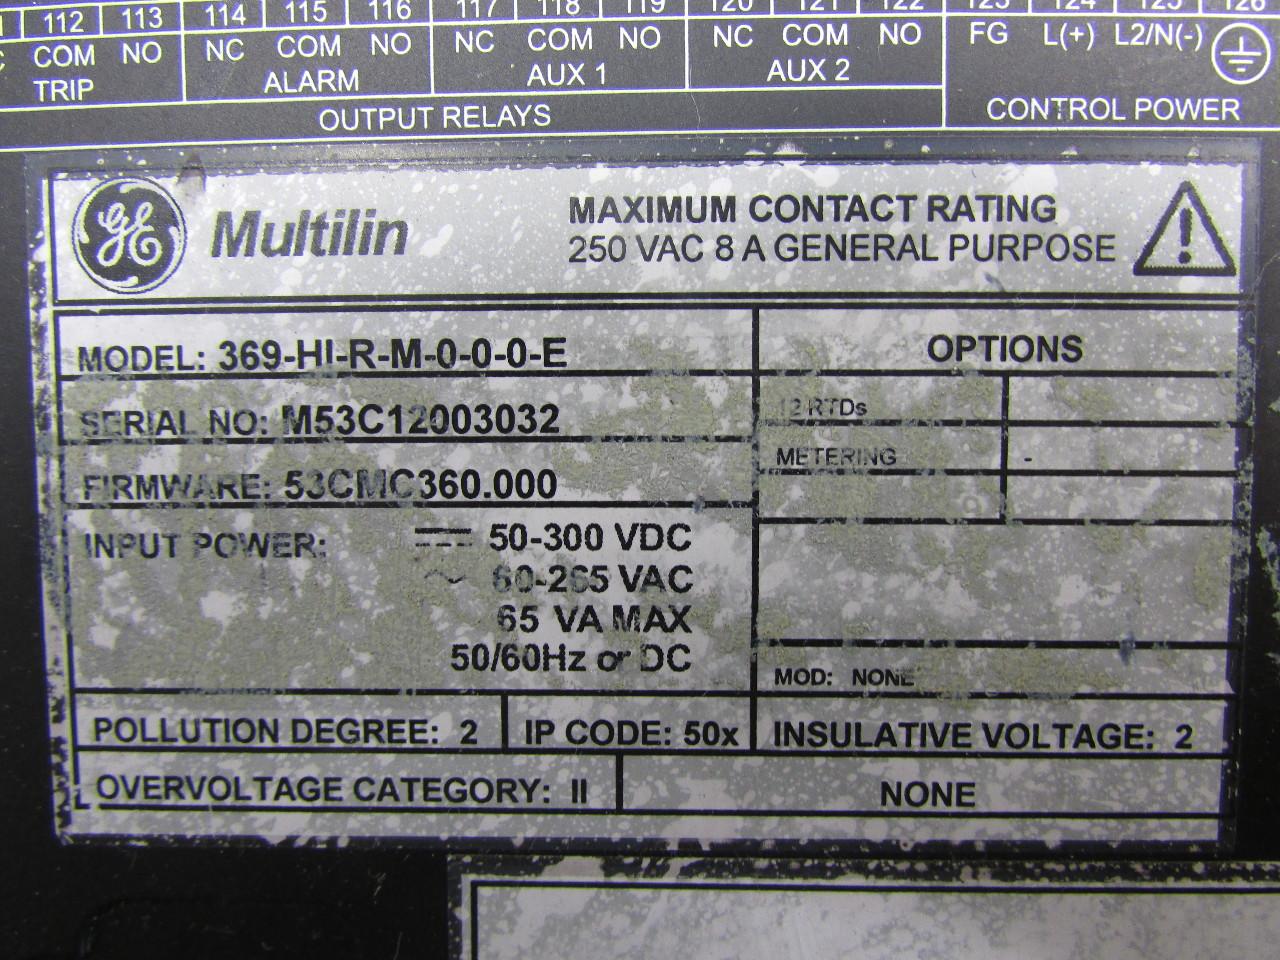 Ge Multilin 369 Hi R M 0 0 0 E 369 Motor Management Relay